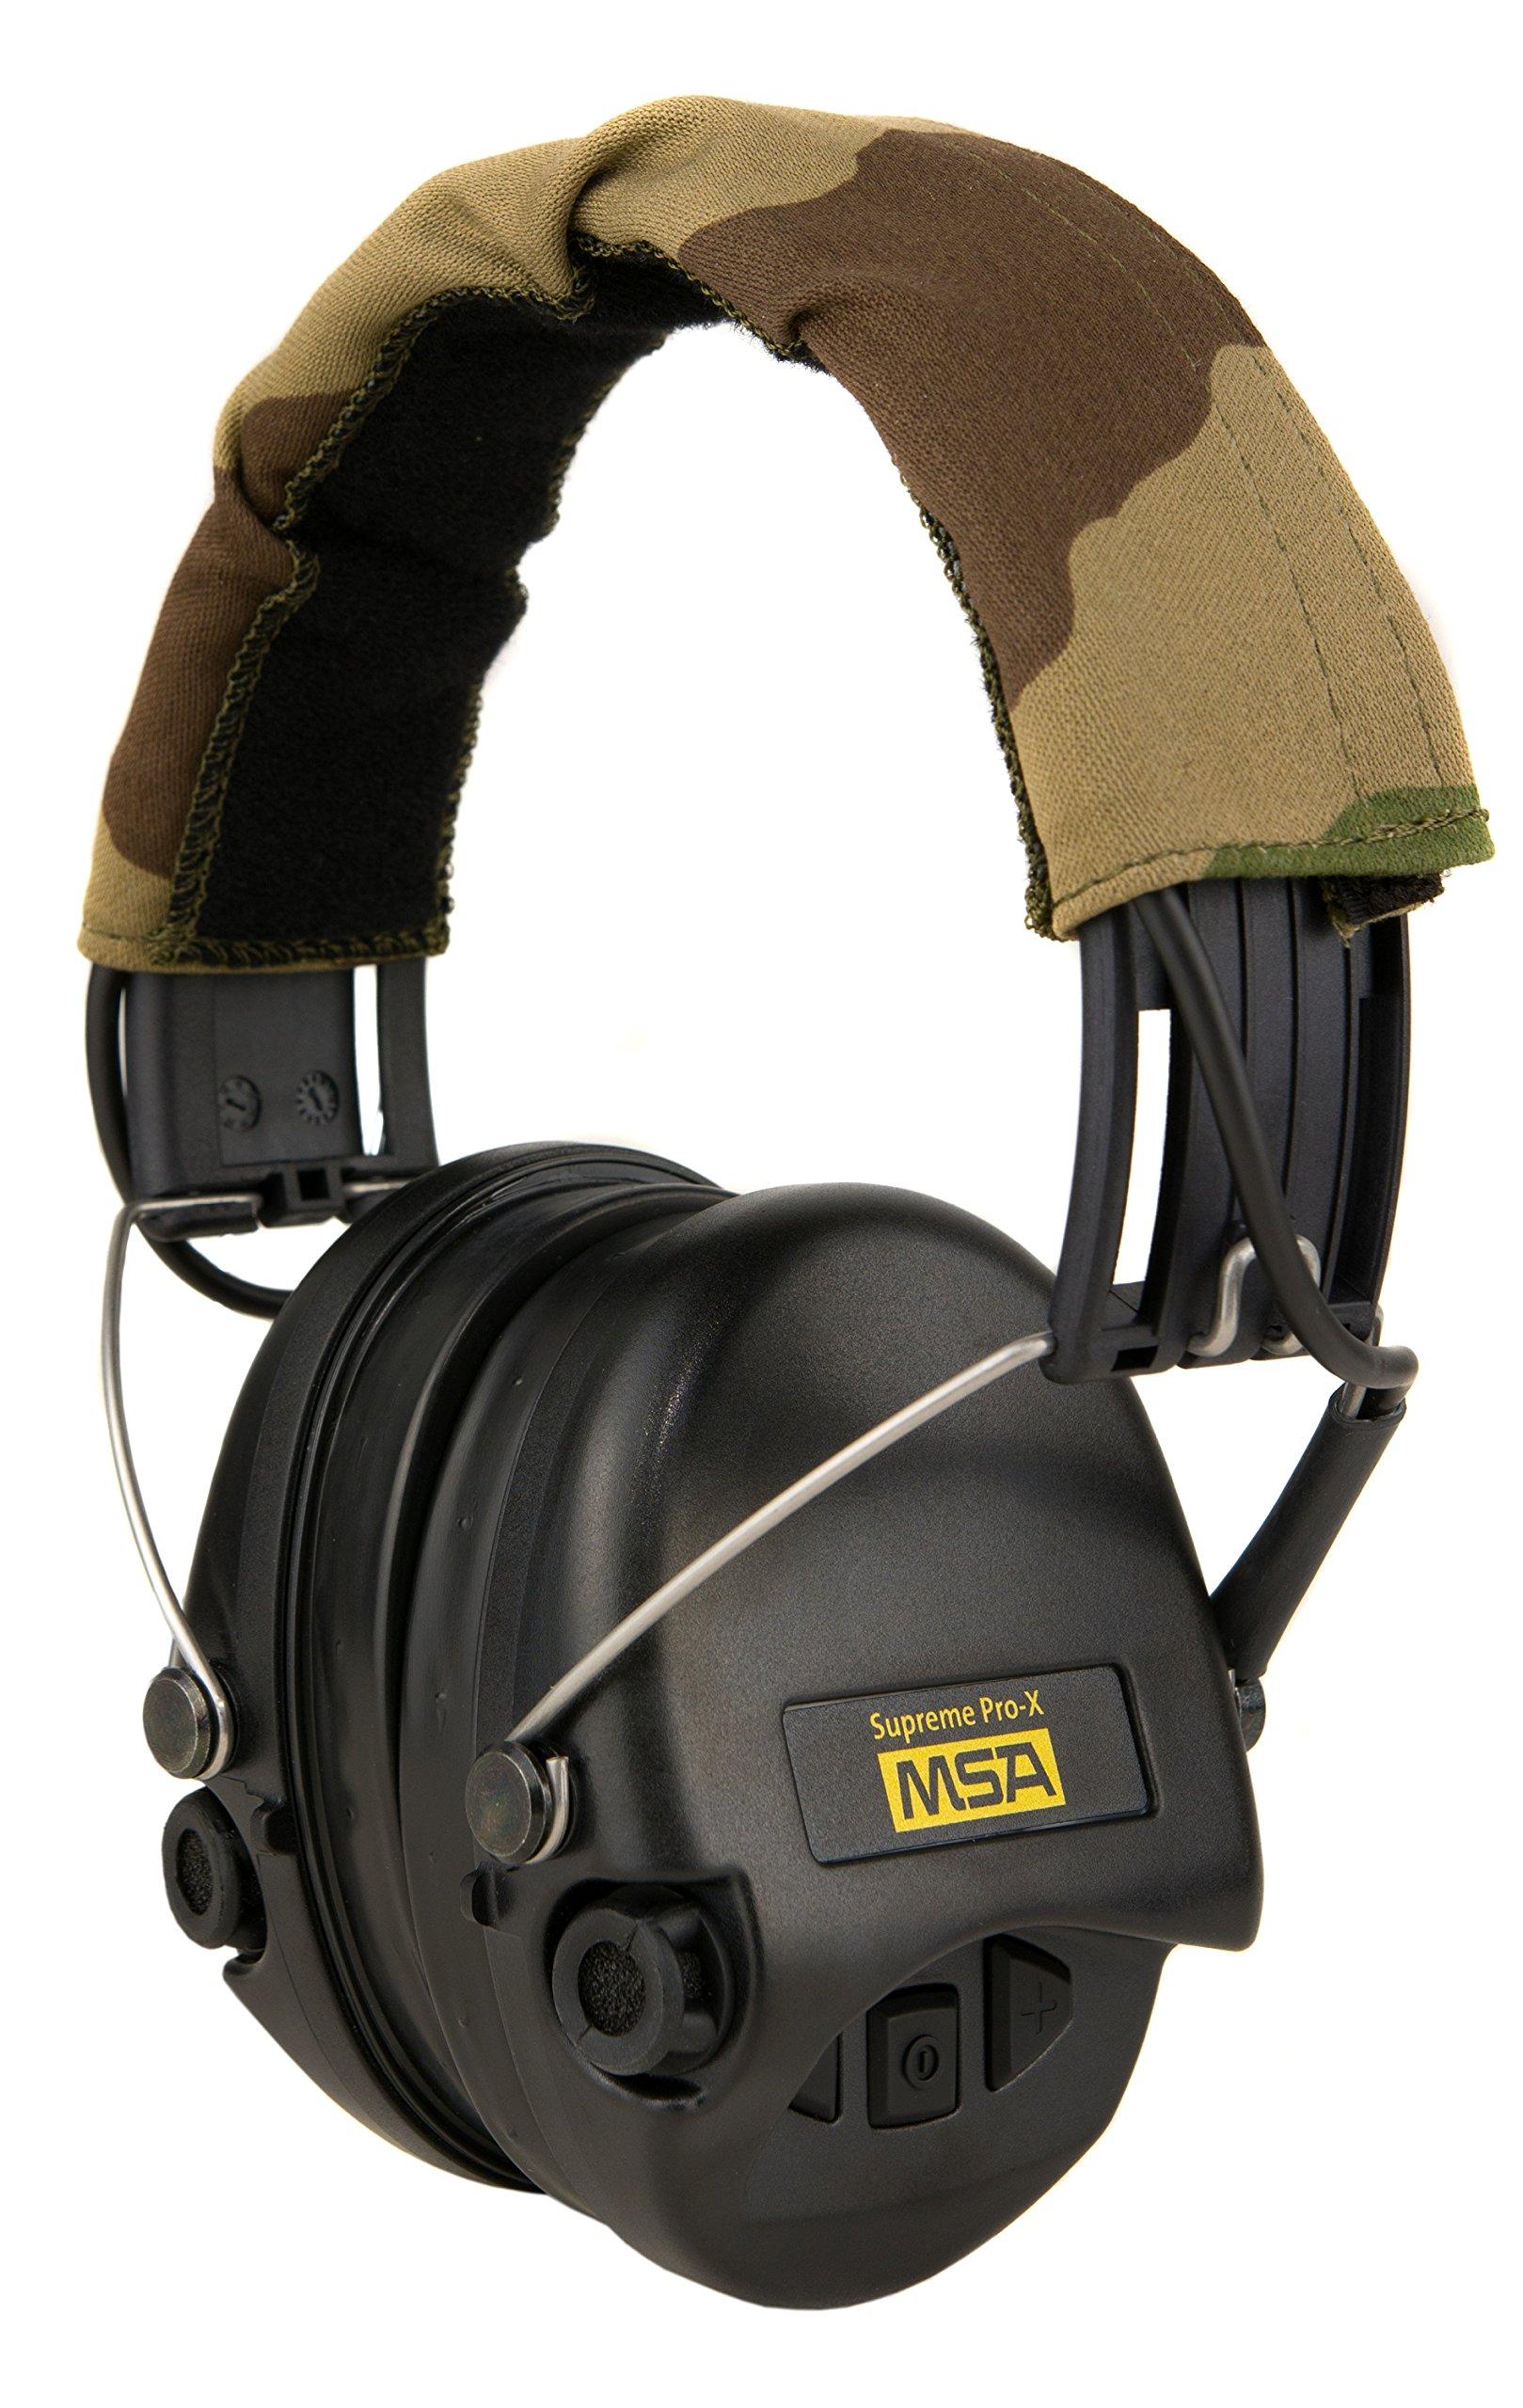 MSA Sordin Supreme PRO X - Digital Electronic Earmuff Amplification Camo-Black Gel-Seals by MSA Sordin